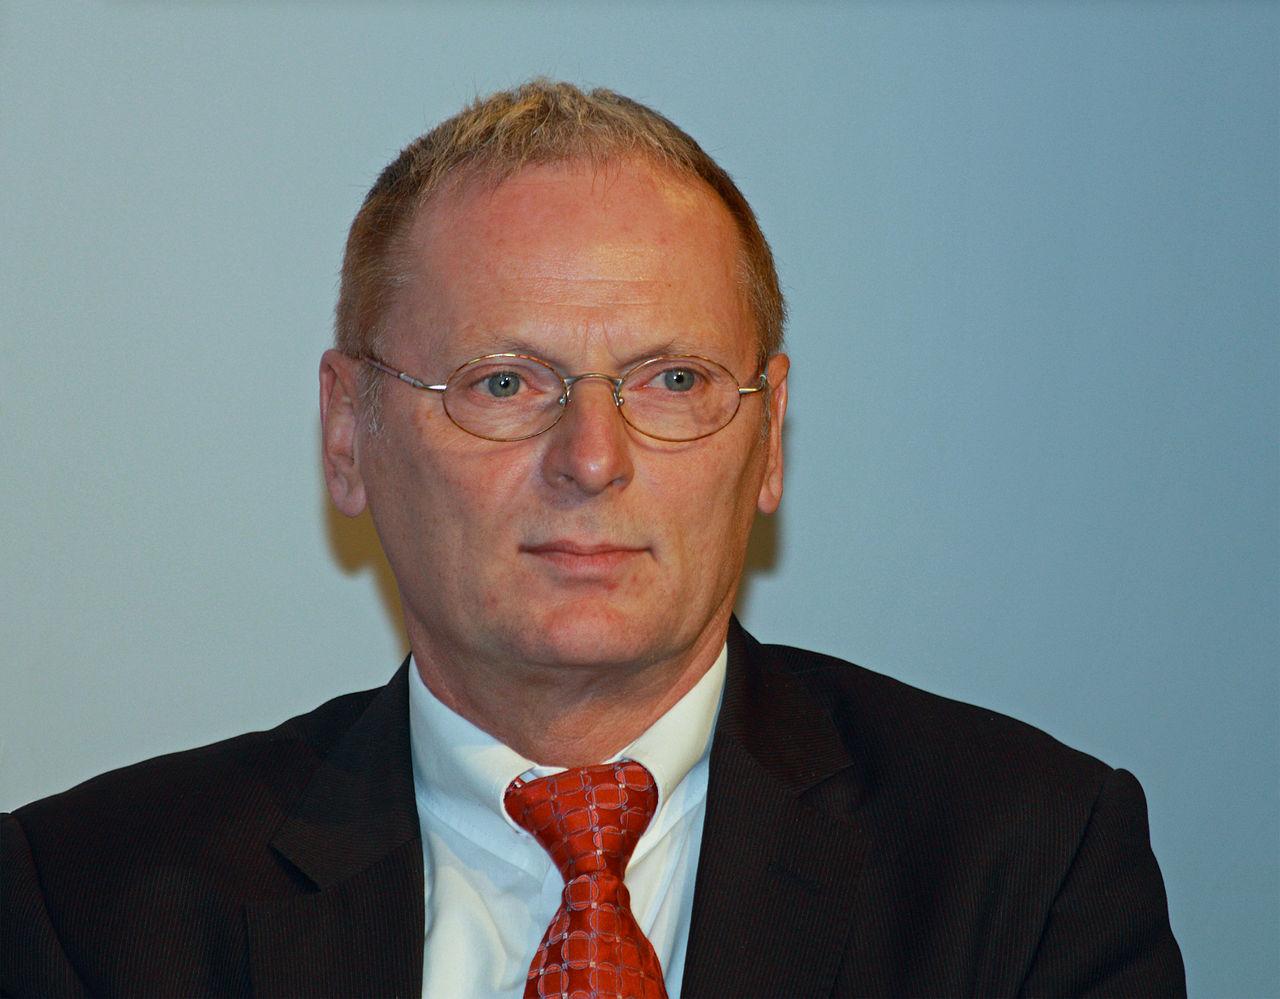 Höhere Netzentgelte für Eigenversorger wünscht BNetzA Präsident Homann 1